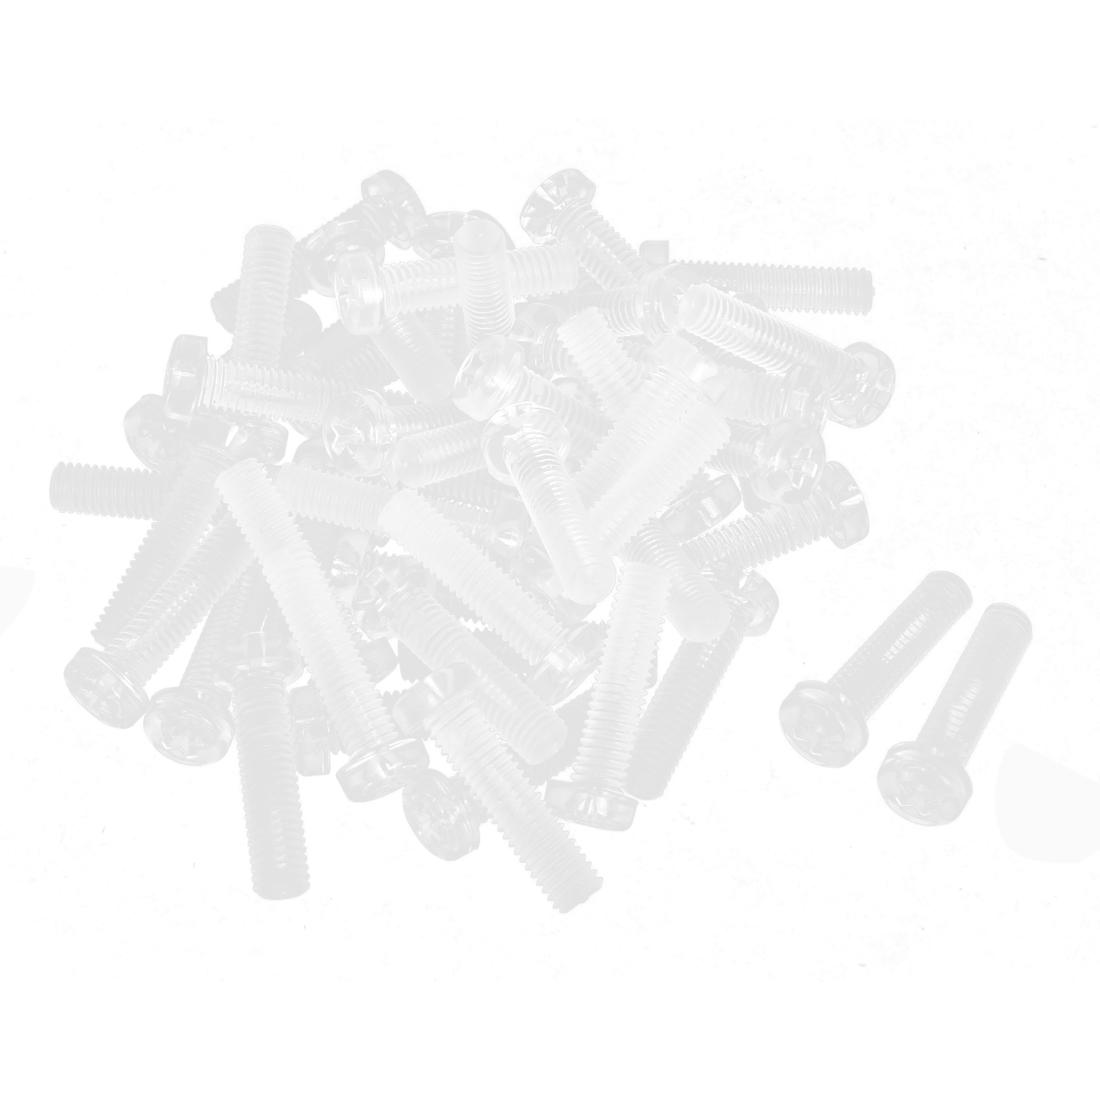 M5 x 20mm Clear Polycarbonate Round Head Cross Phillips Screws Bolt 50pcs